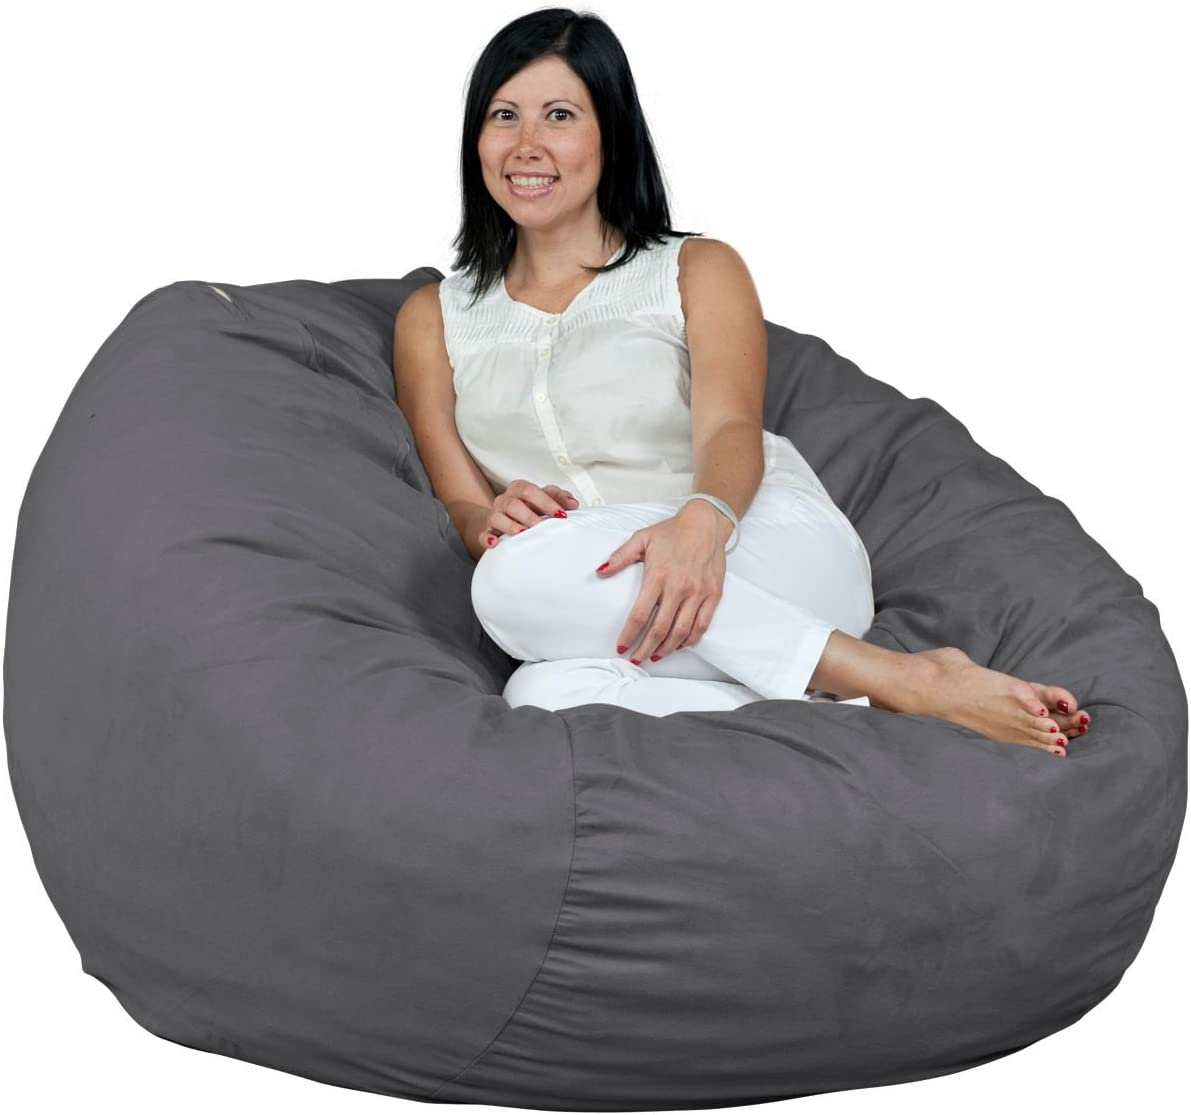 FUGU Bean Bag Chair, Premium Foam Filled 4 XL, Protective Liner Plus Removable Machine Wash Grey Cover